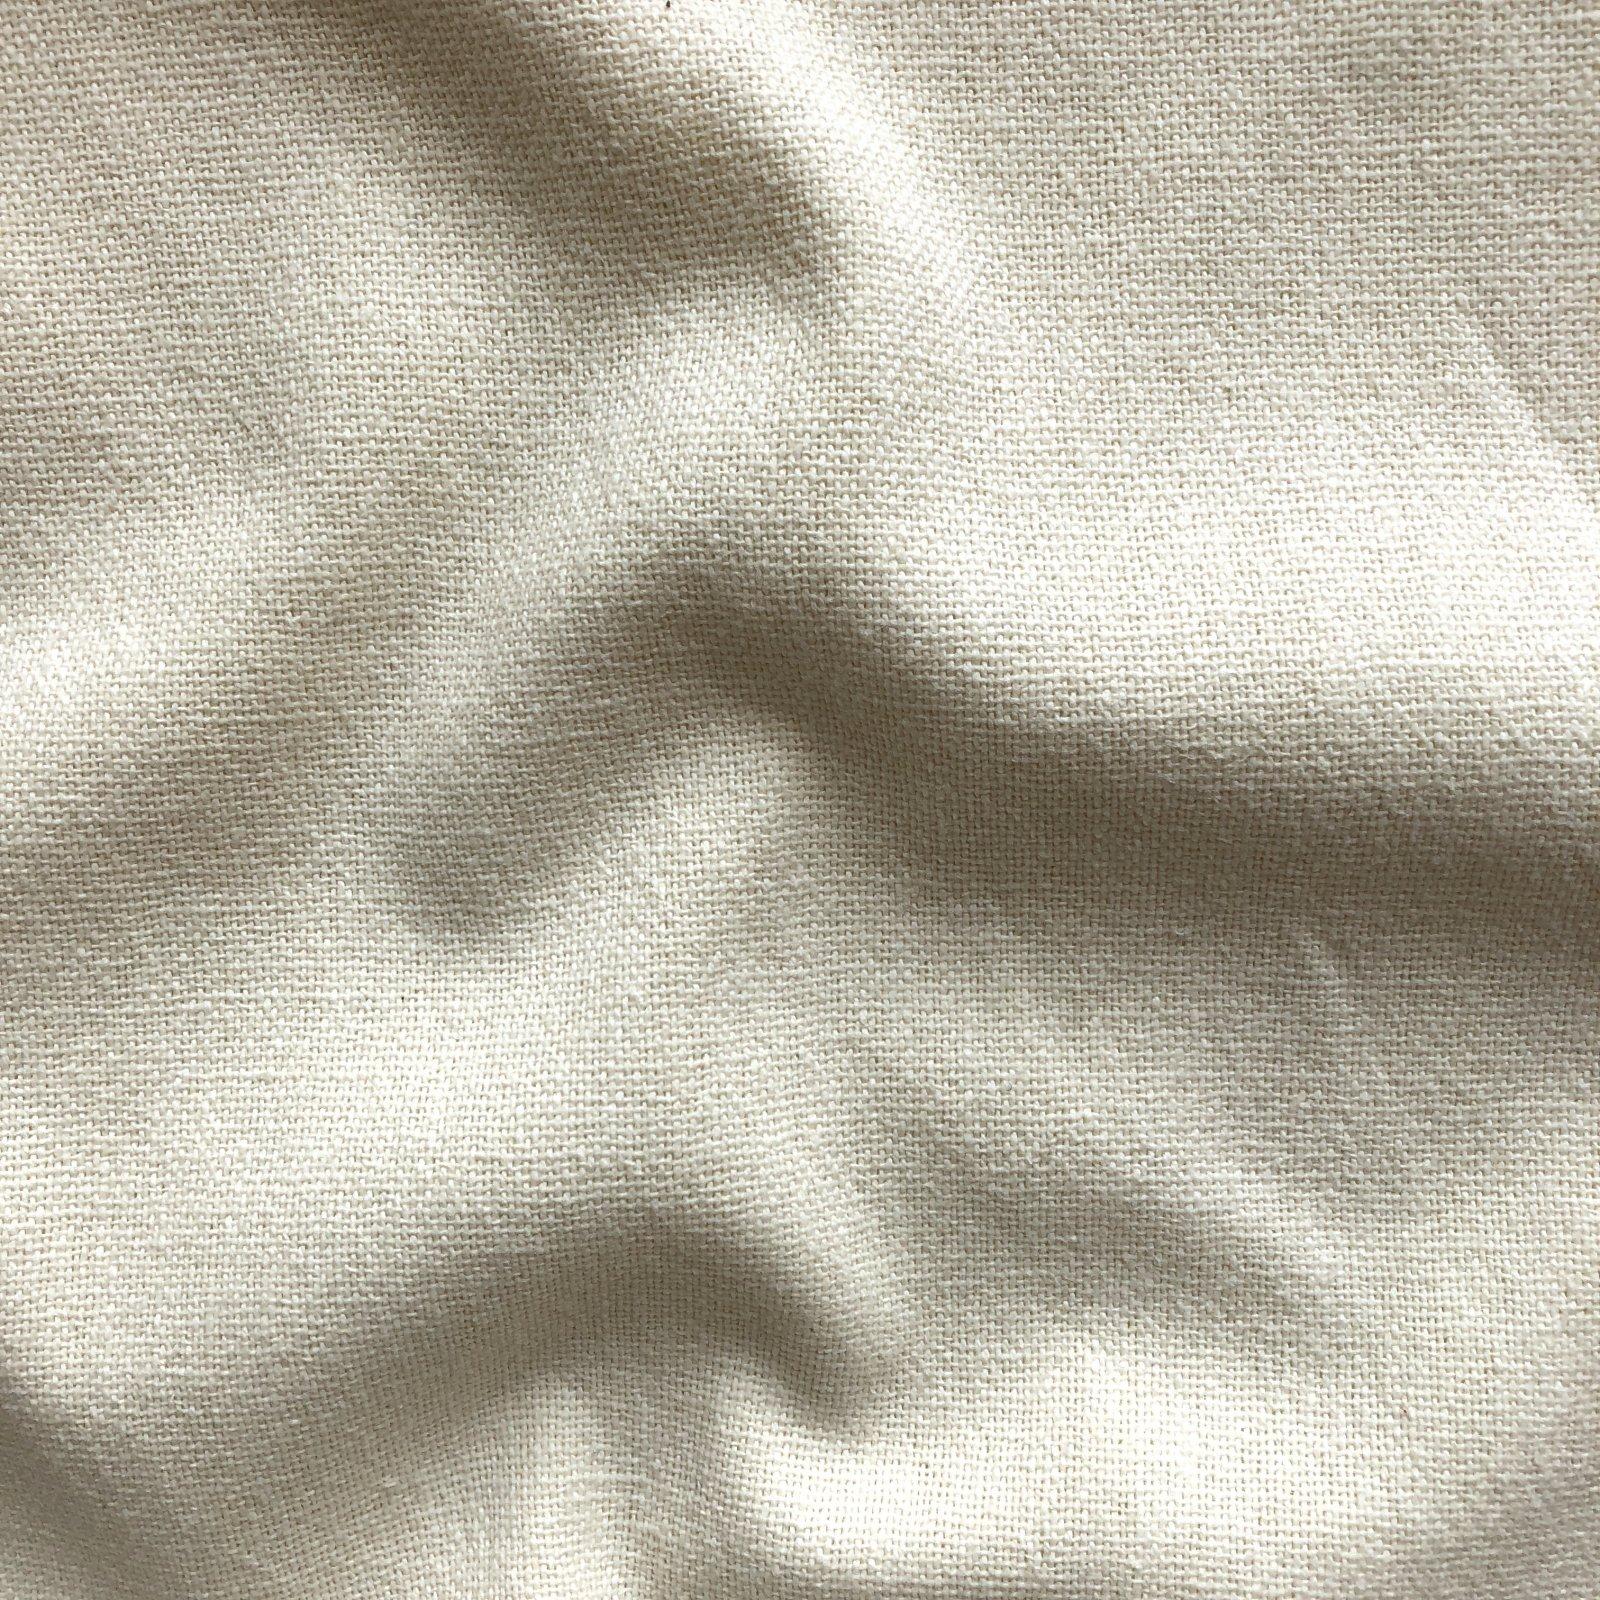 Kolkata Cloth - Textured Cotton - Ivory